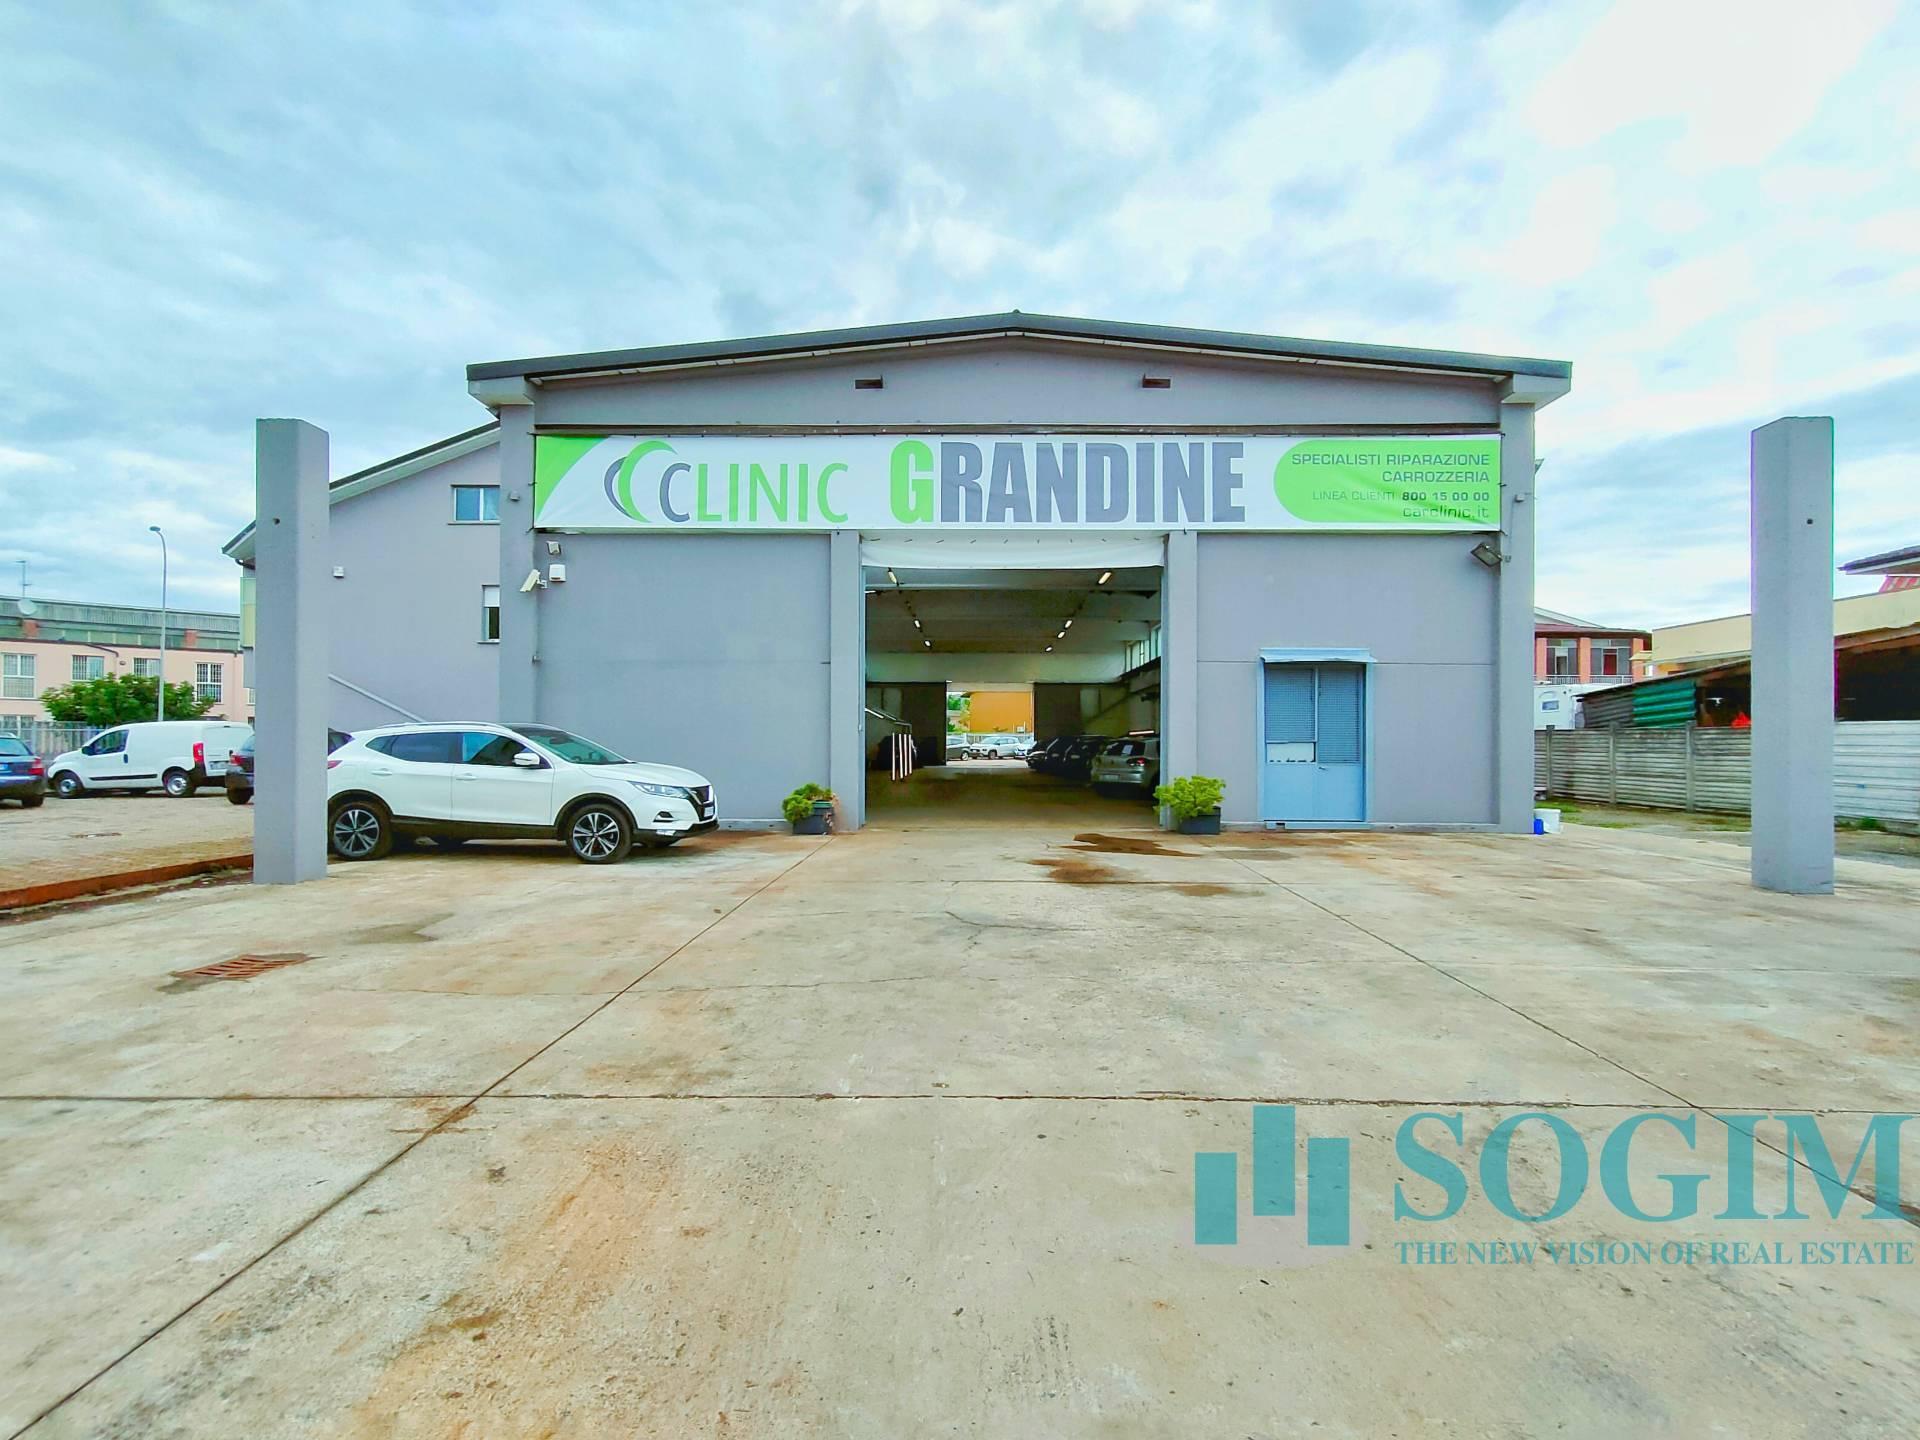 Vendita Capannone Commerciale/Industriale Cerro al Lambro 261479